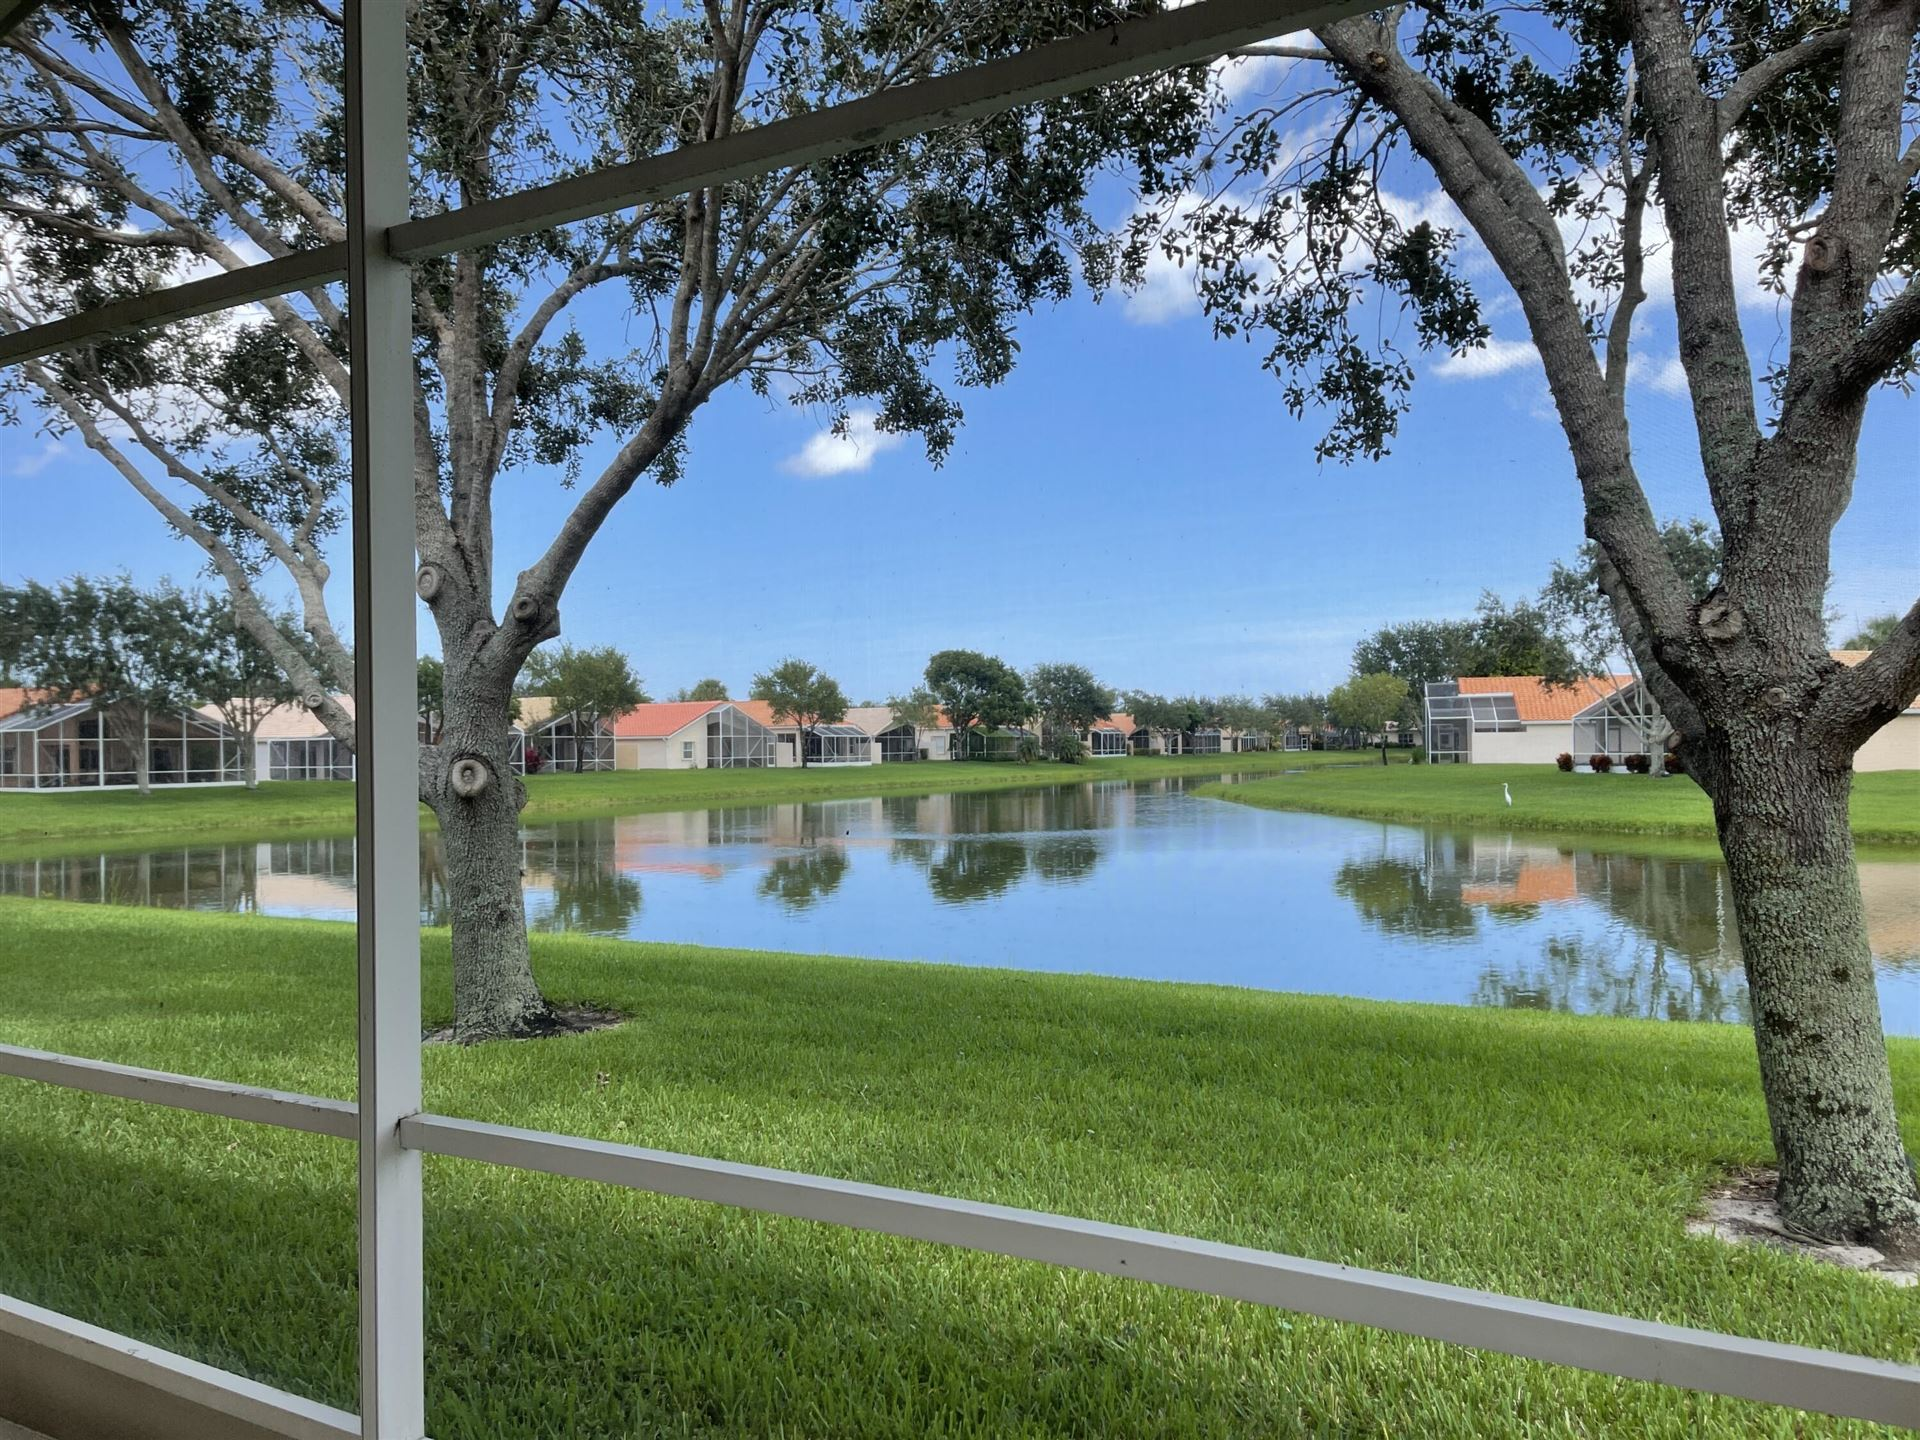 7134 Treviso Lane, Boynton Beach, FL 33472 - MLS#: RX-10744772